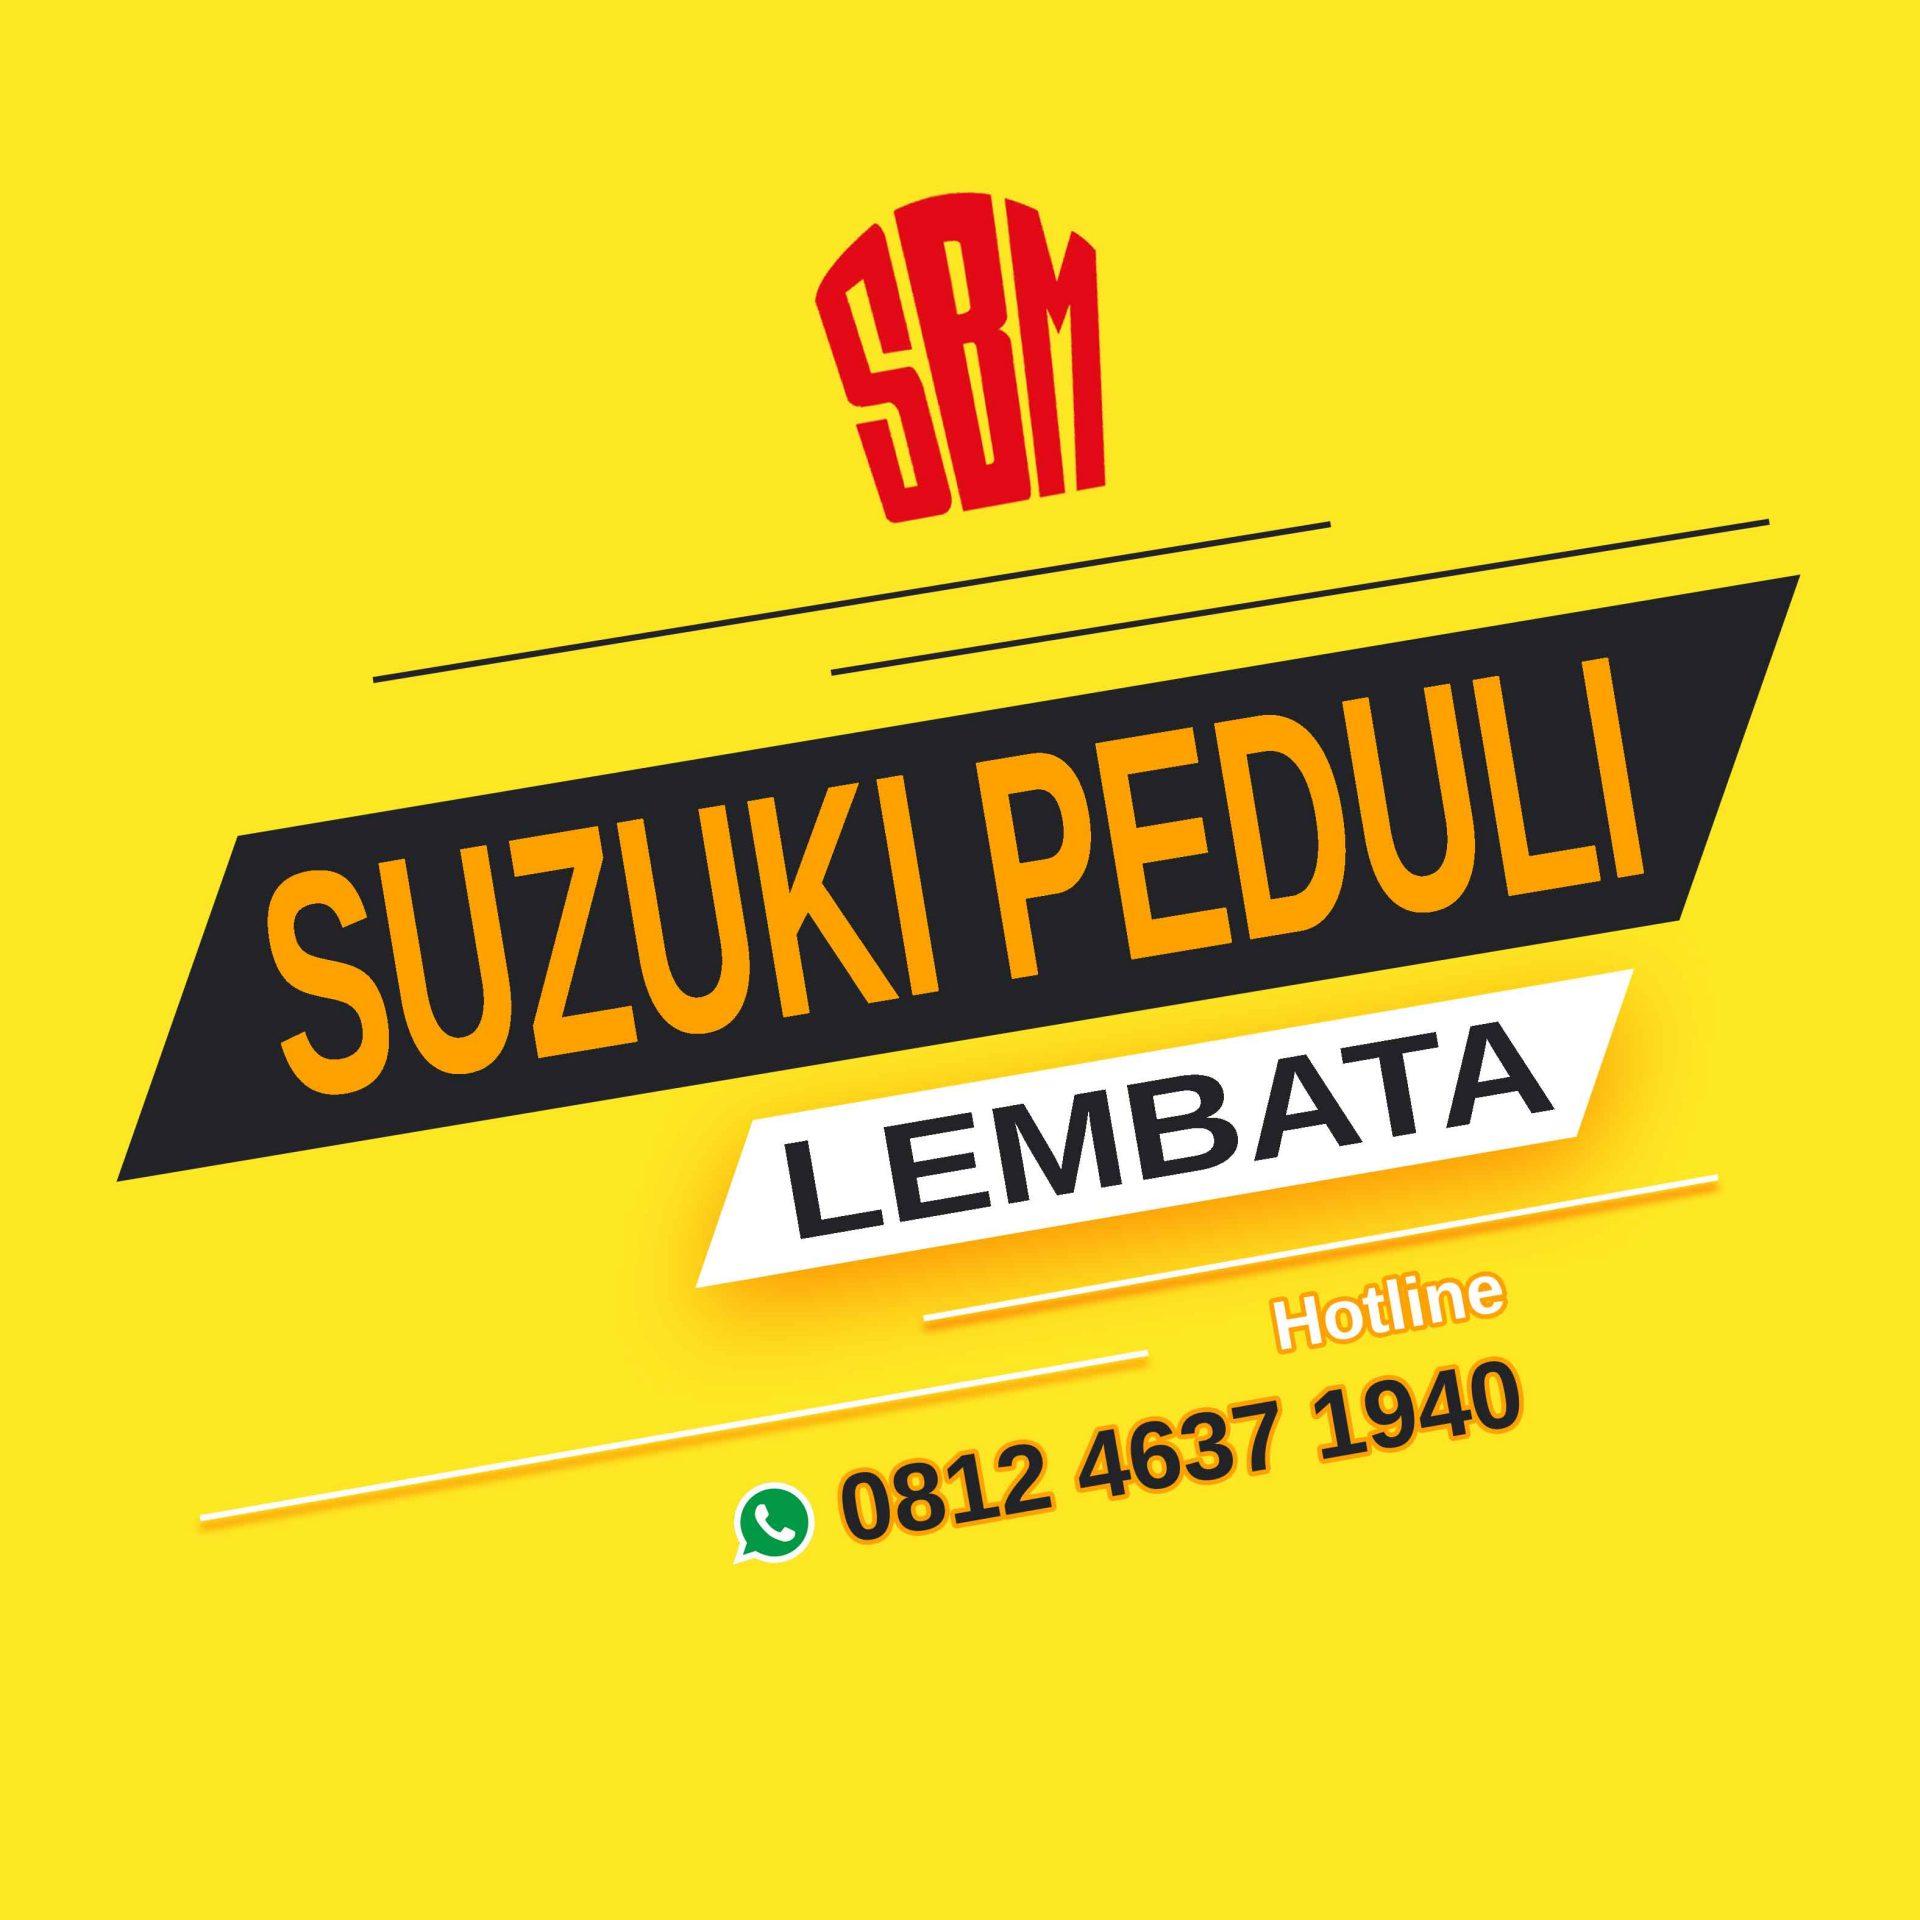 Suzuki Peduli Lembata SBM